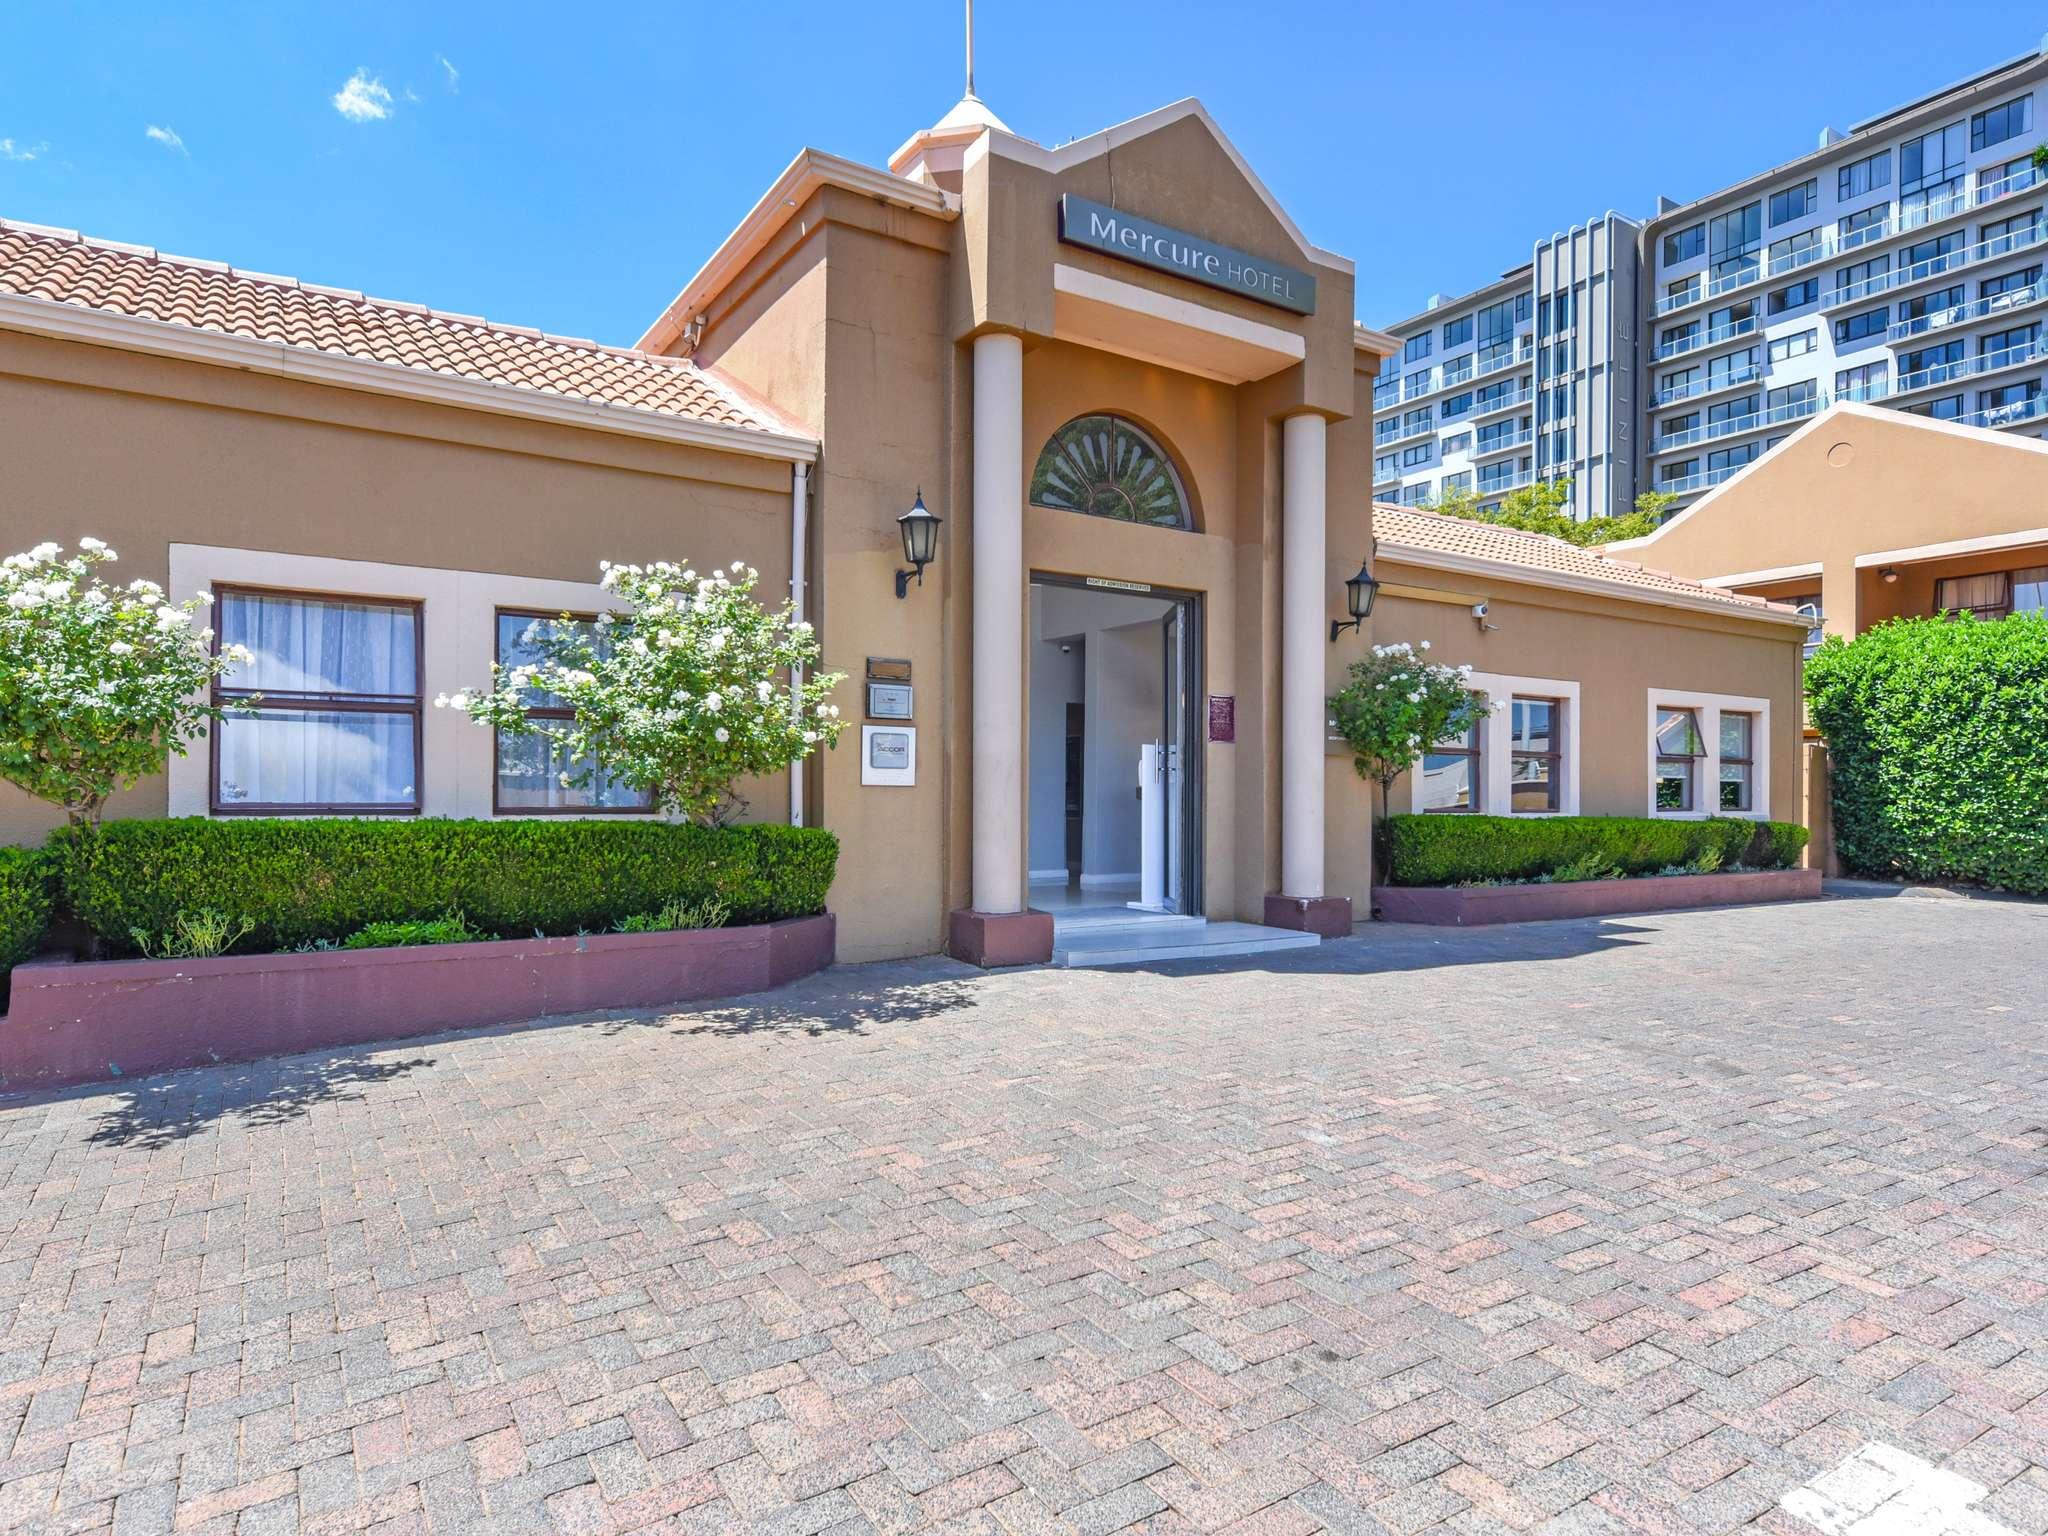 Отель — Mercure Johannesburg Bedfordview Hotel